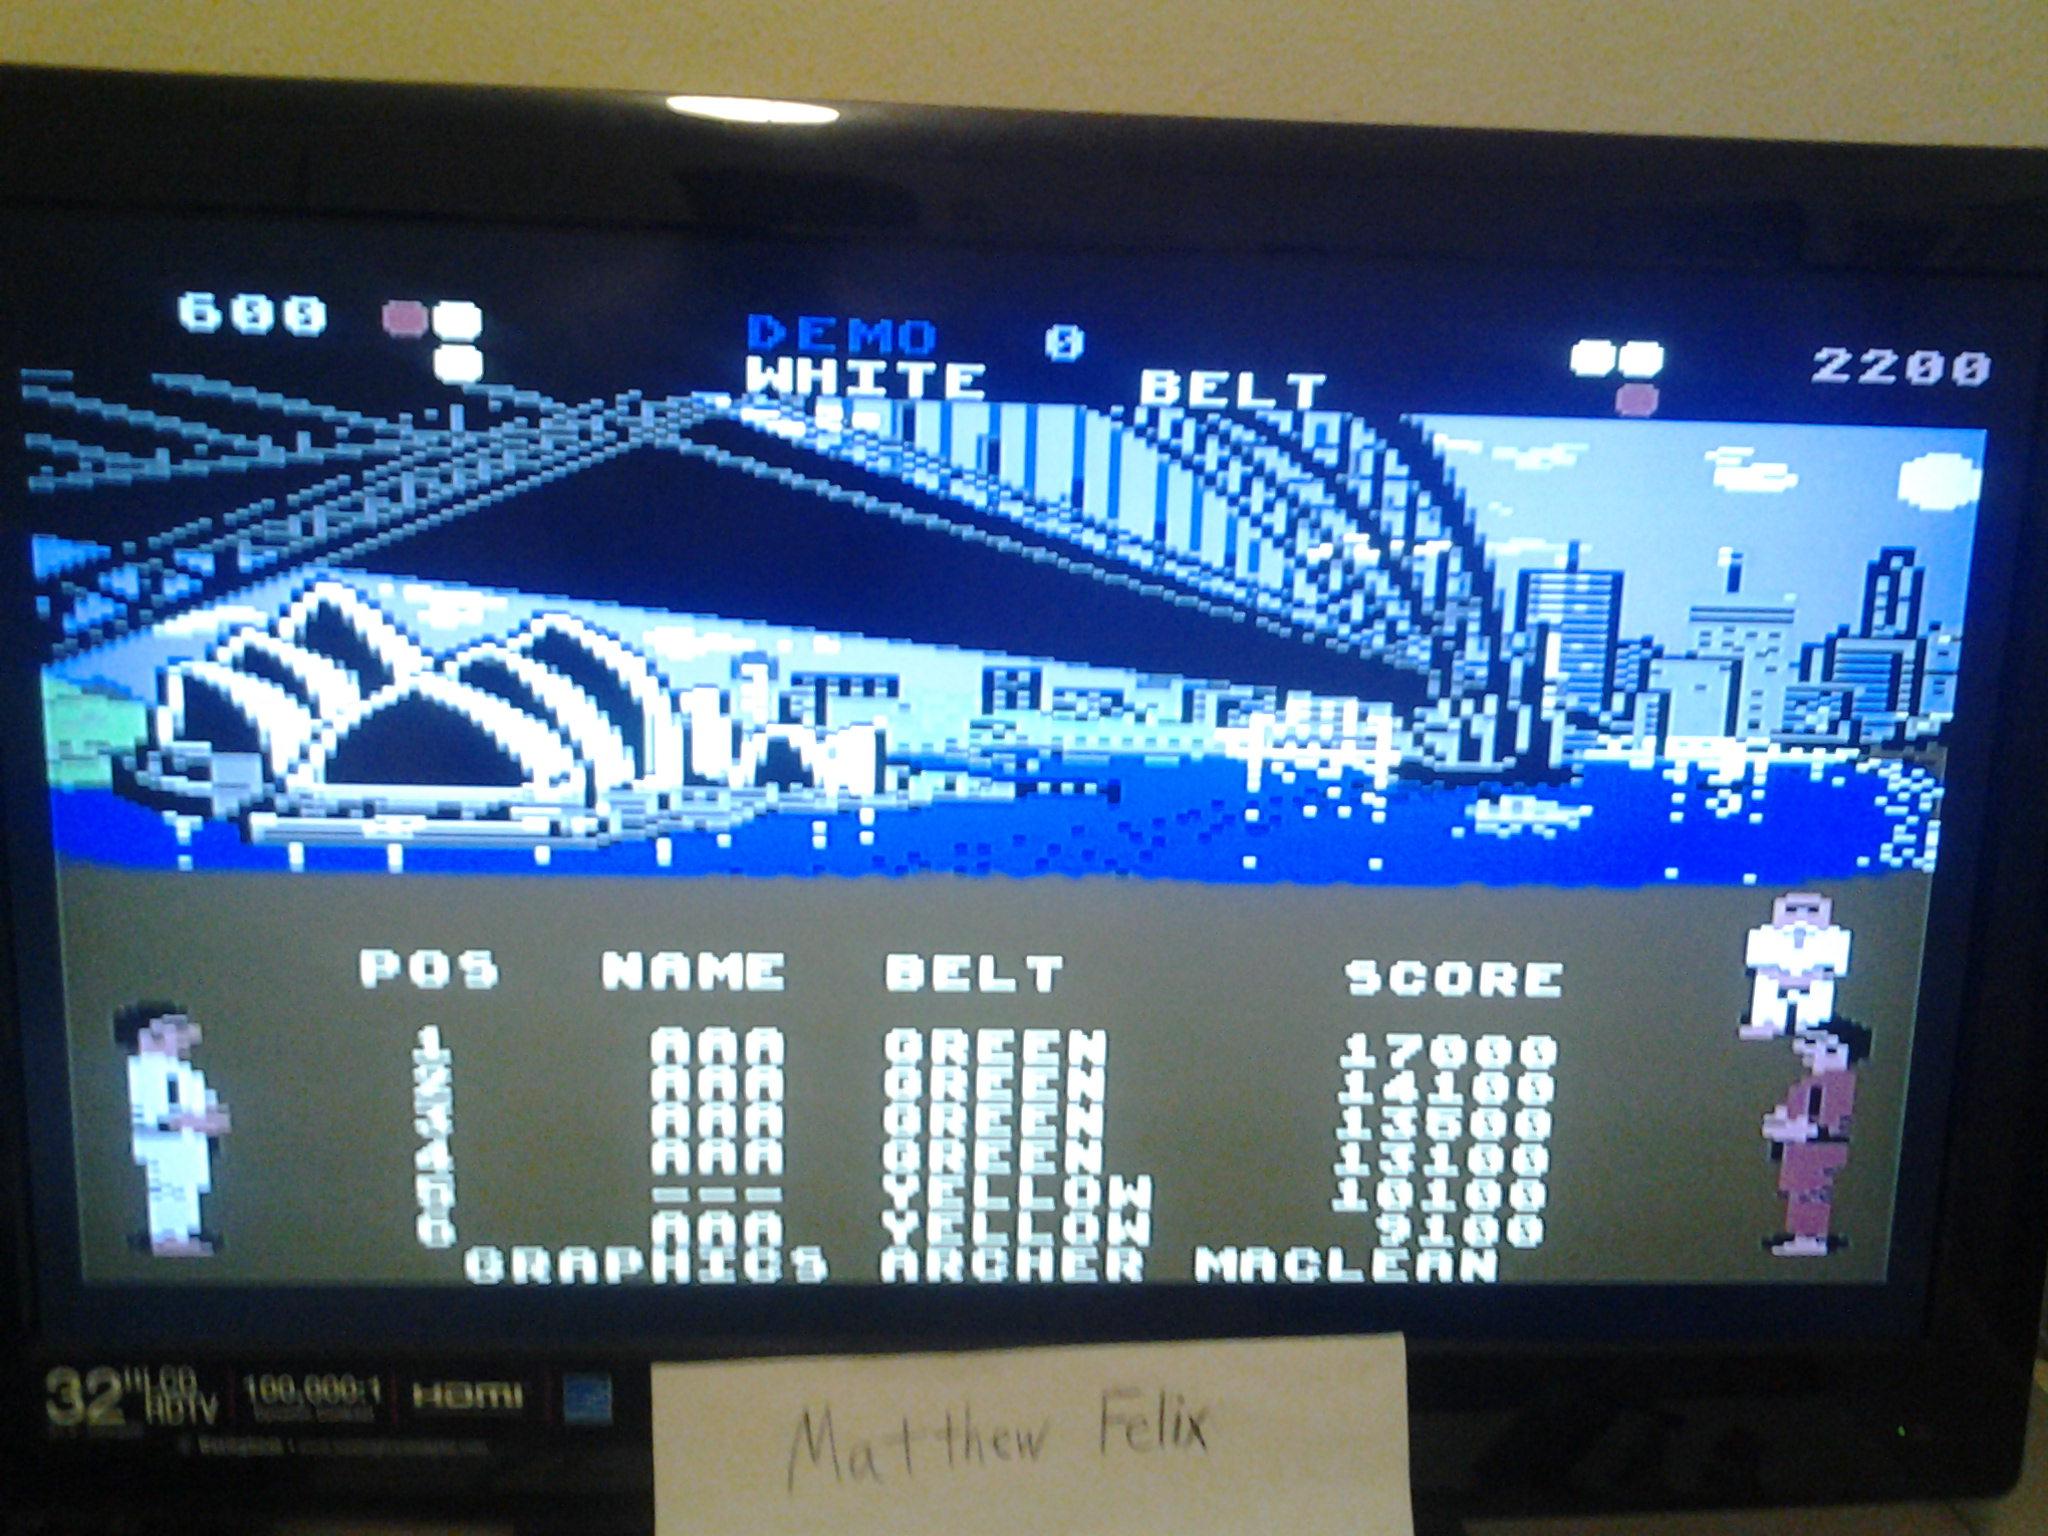 International Karate (Wii Virtual Console: Commodore 64